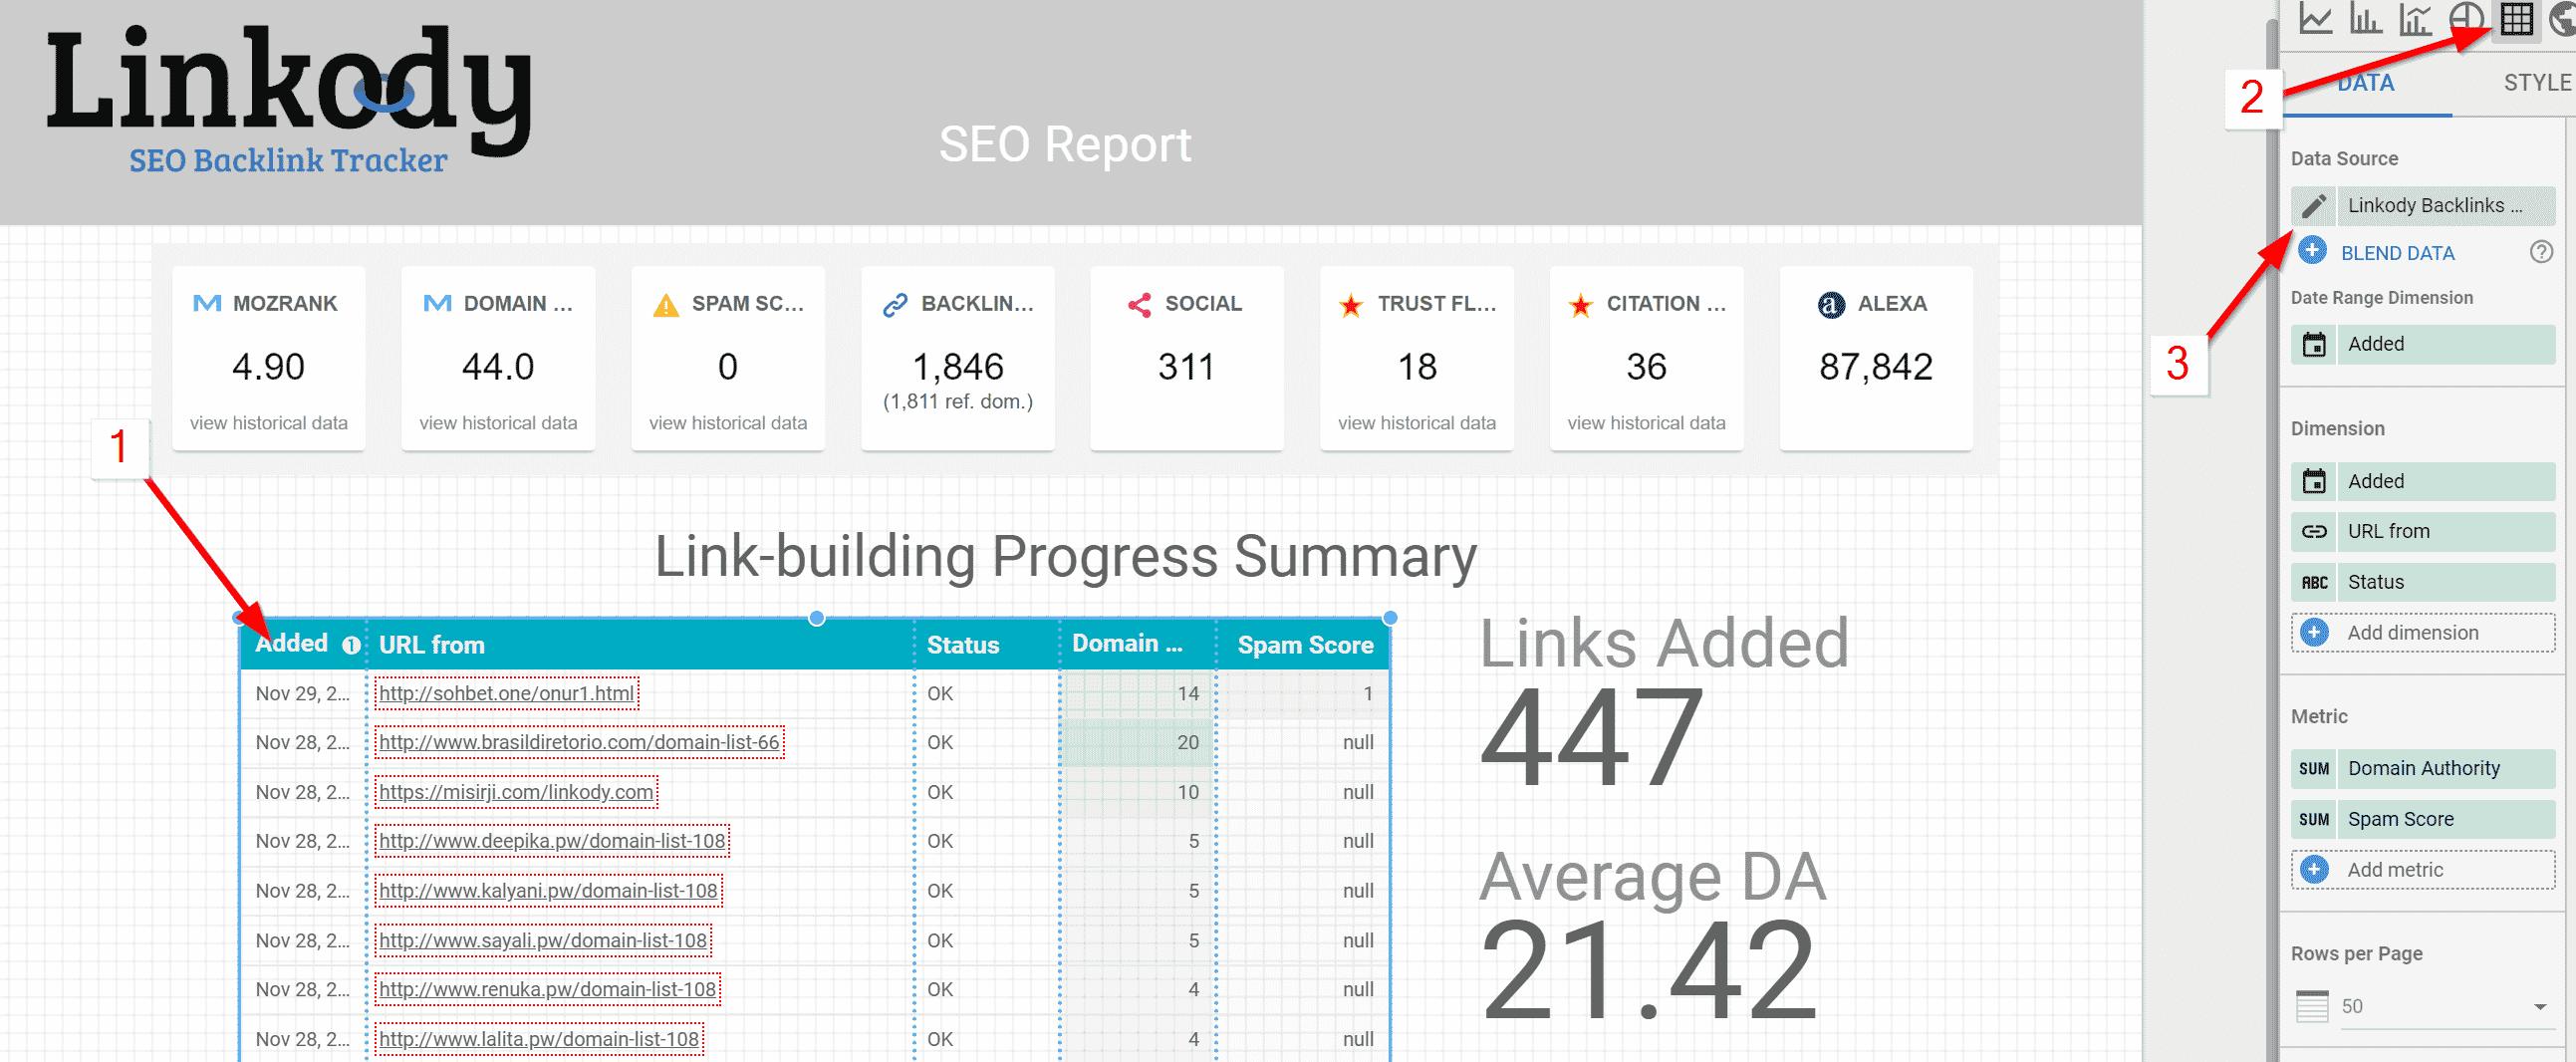 Linkody Data Studio Report